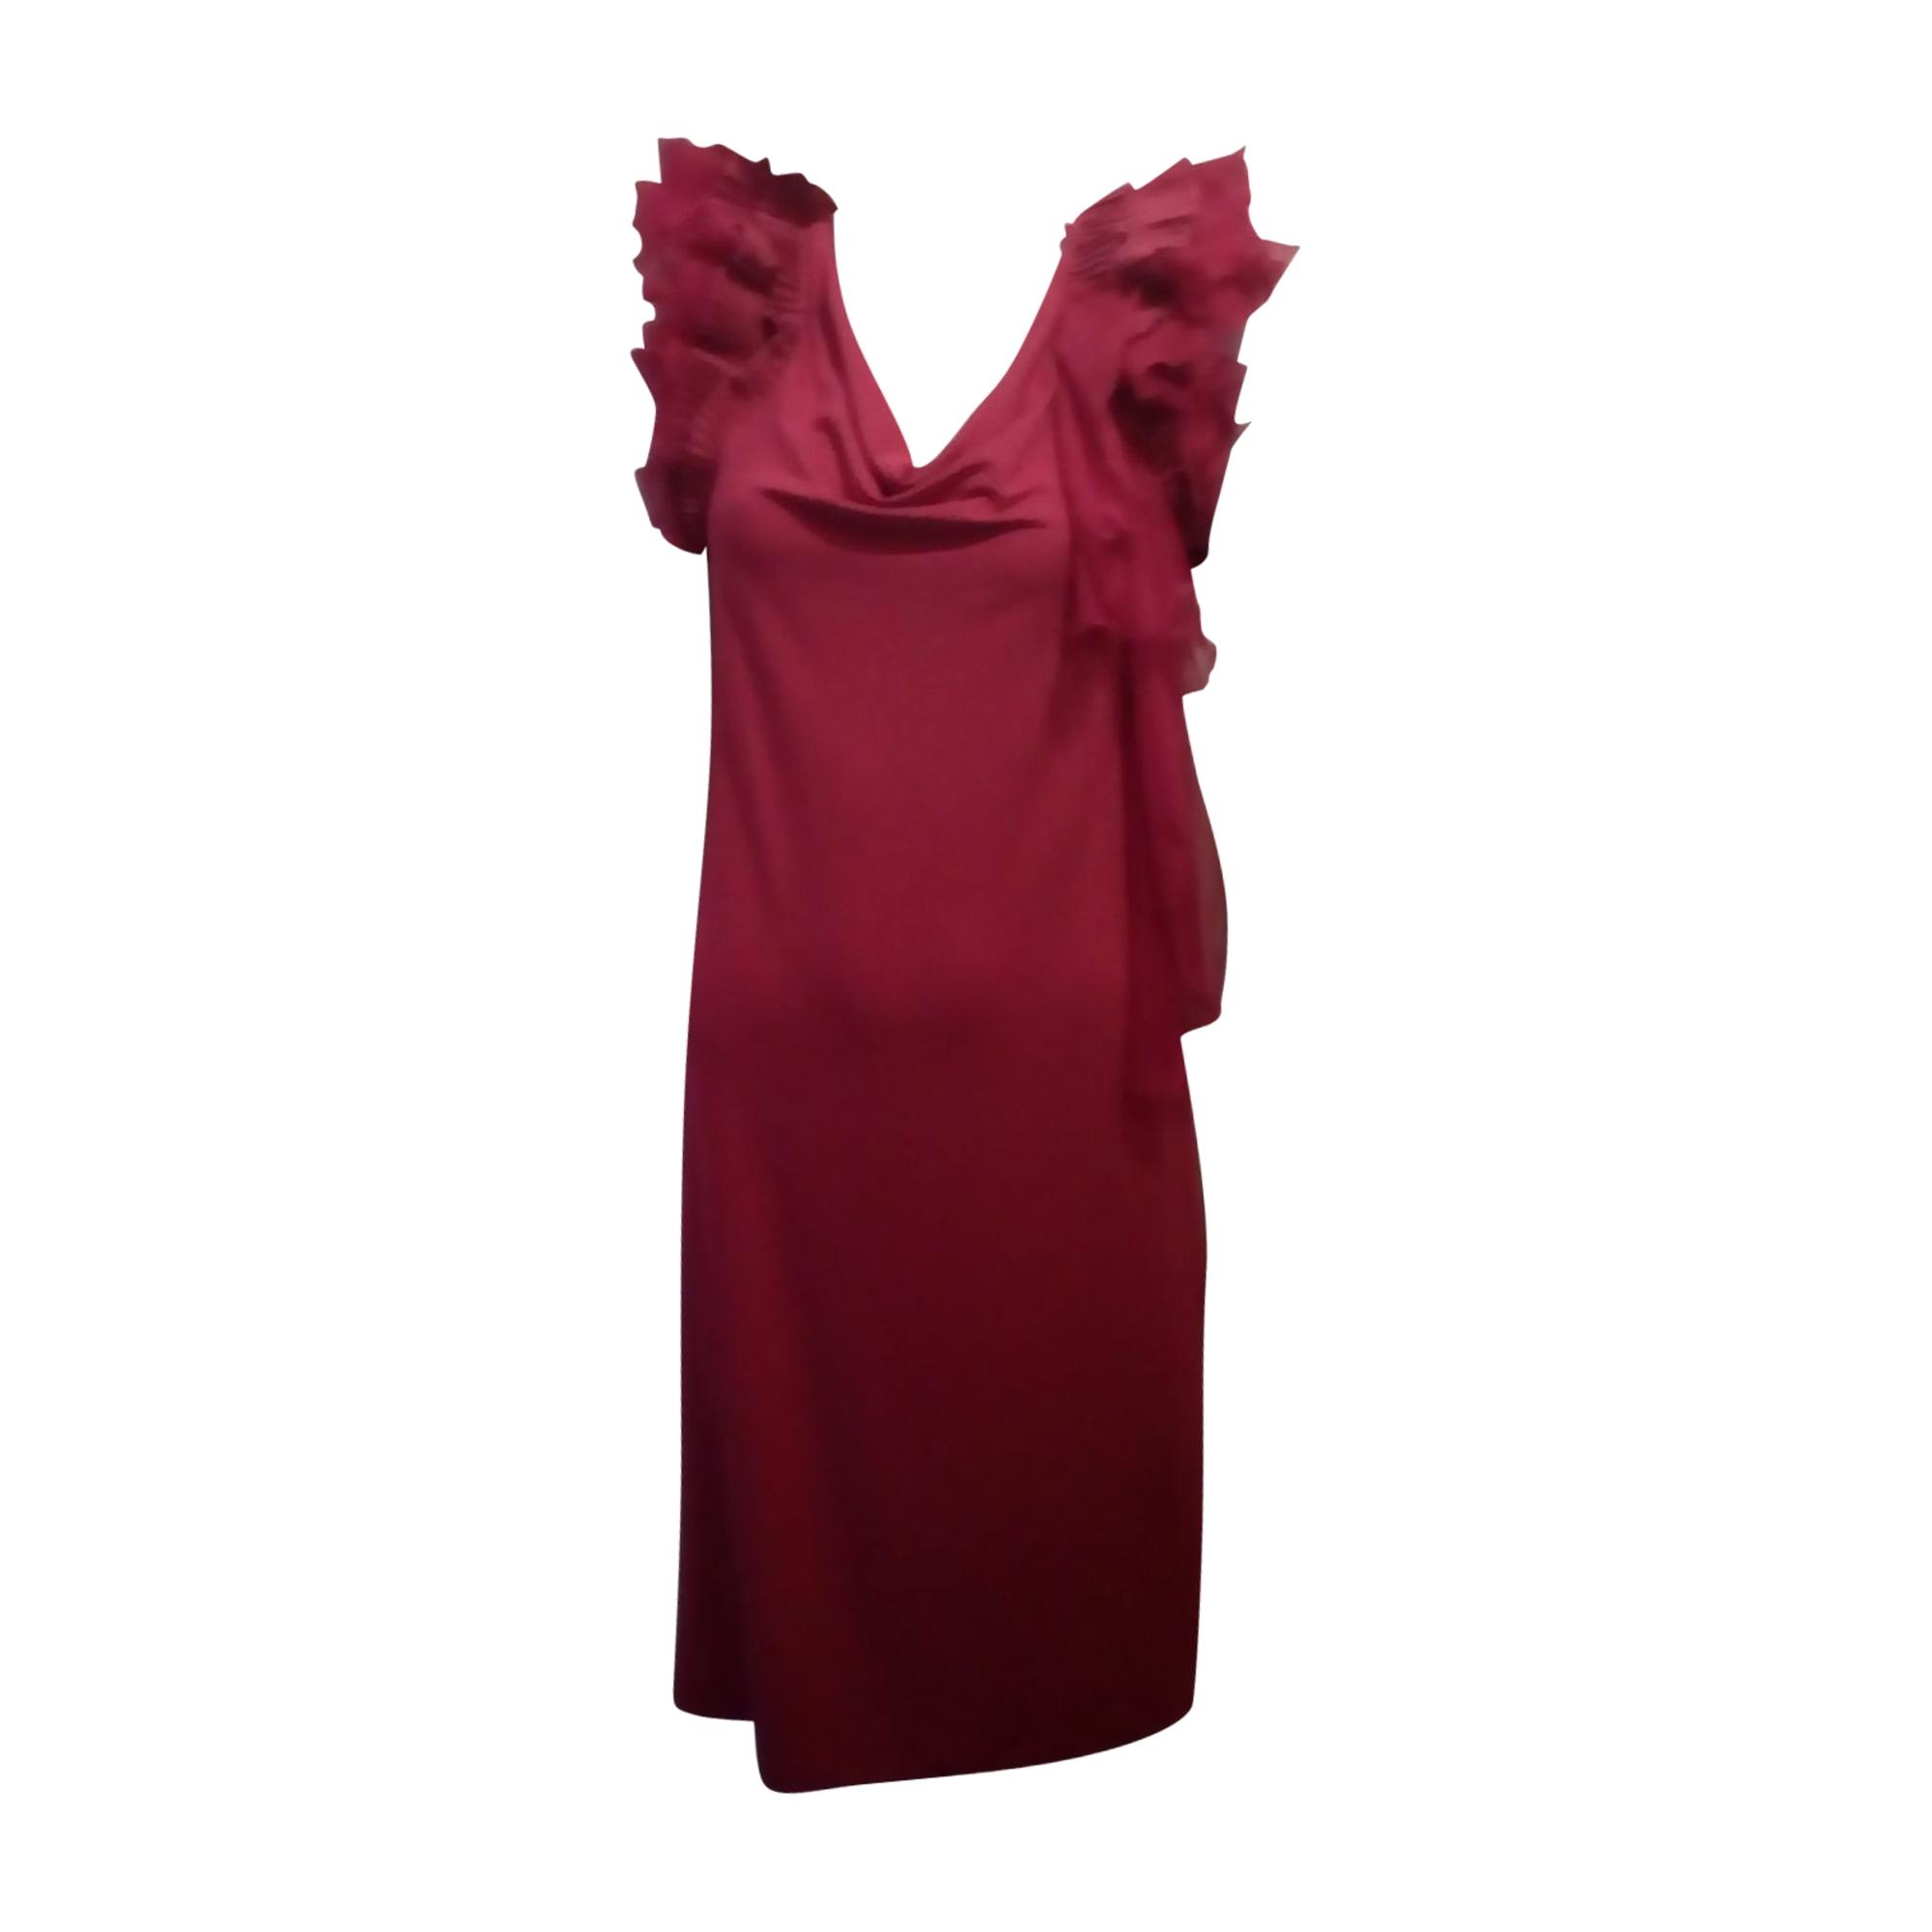 Robe courte GIVENCHY Rose, fuschia, vieux rose